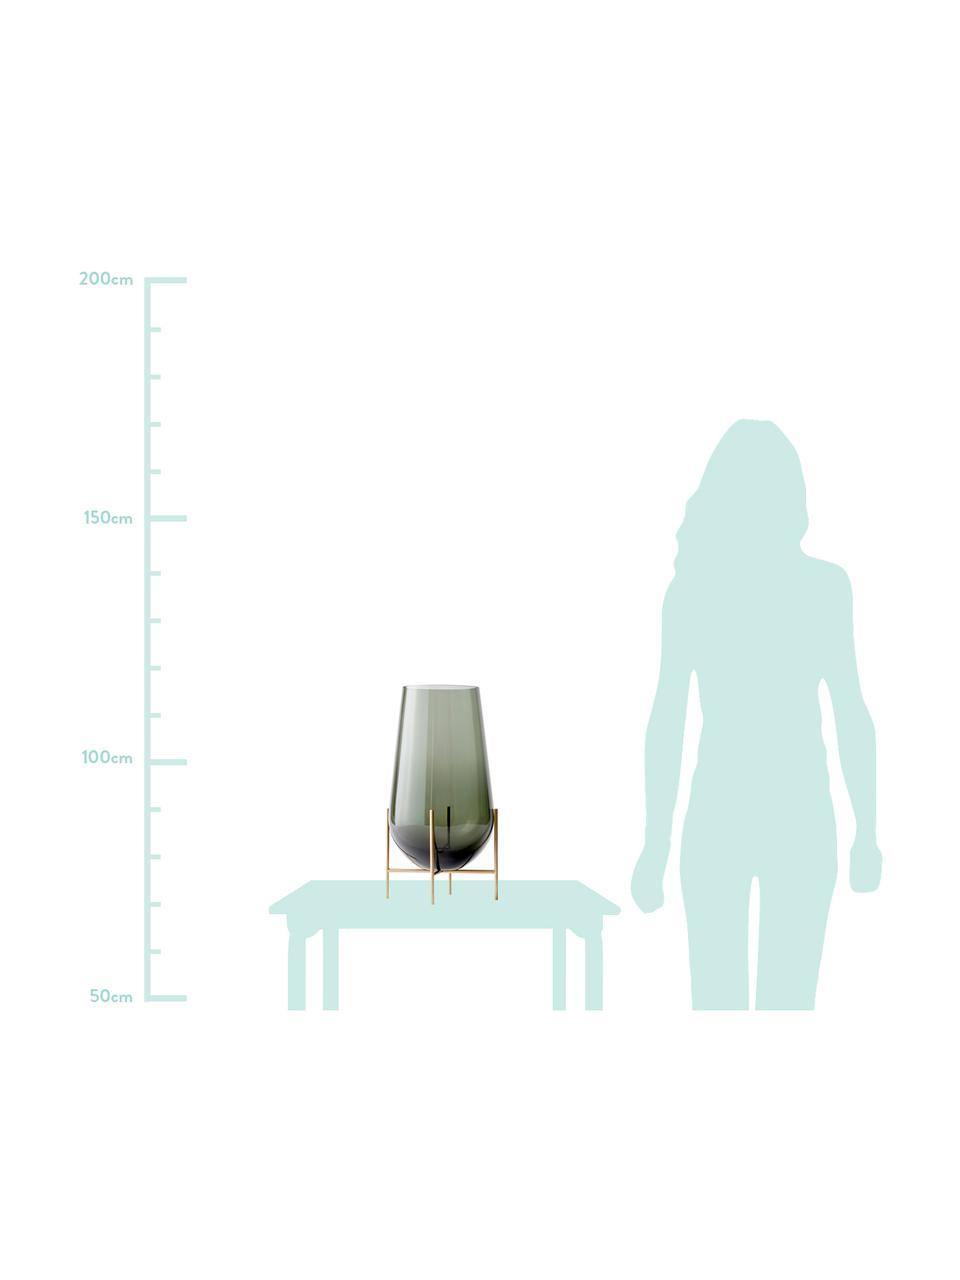 Große Design-Vase Échasse, Gestell: Messing, Vase: Glas, mundgeblasen, Messingfarben, Ø 15 x H 45 cm